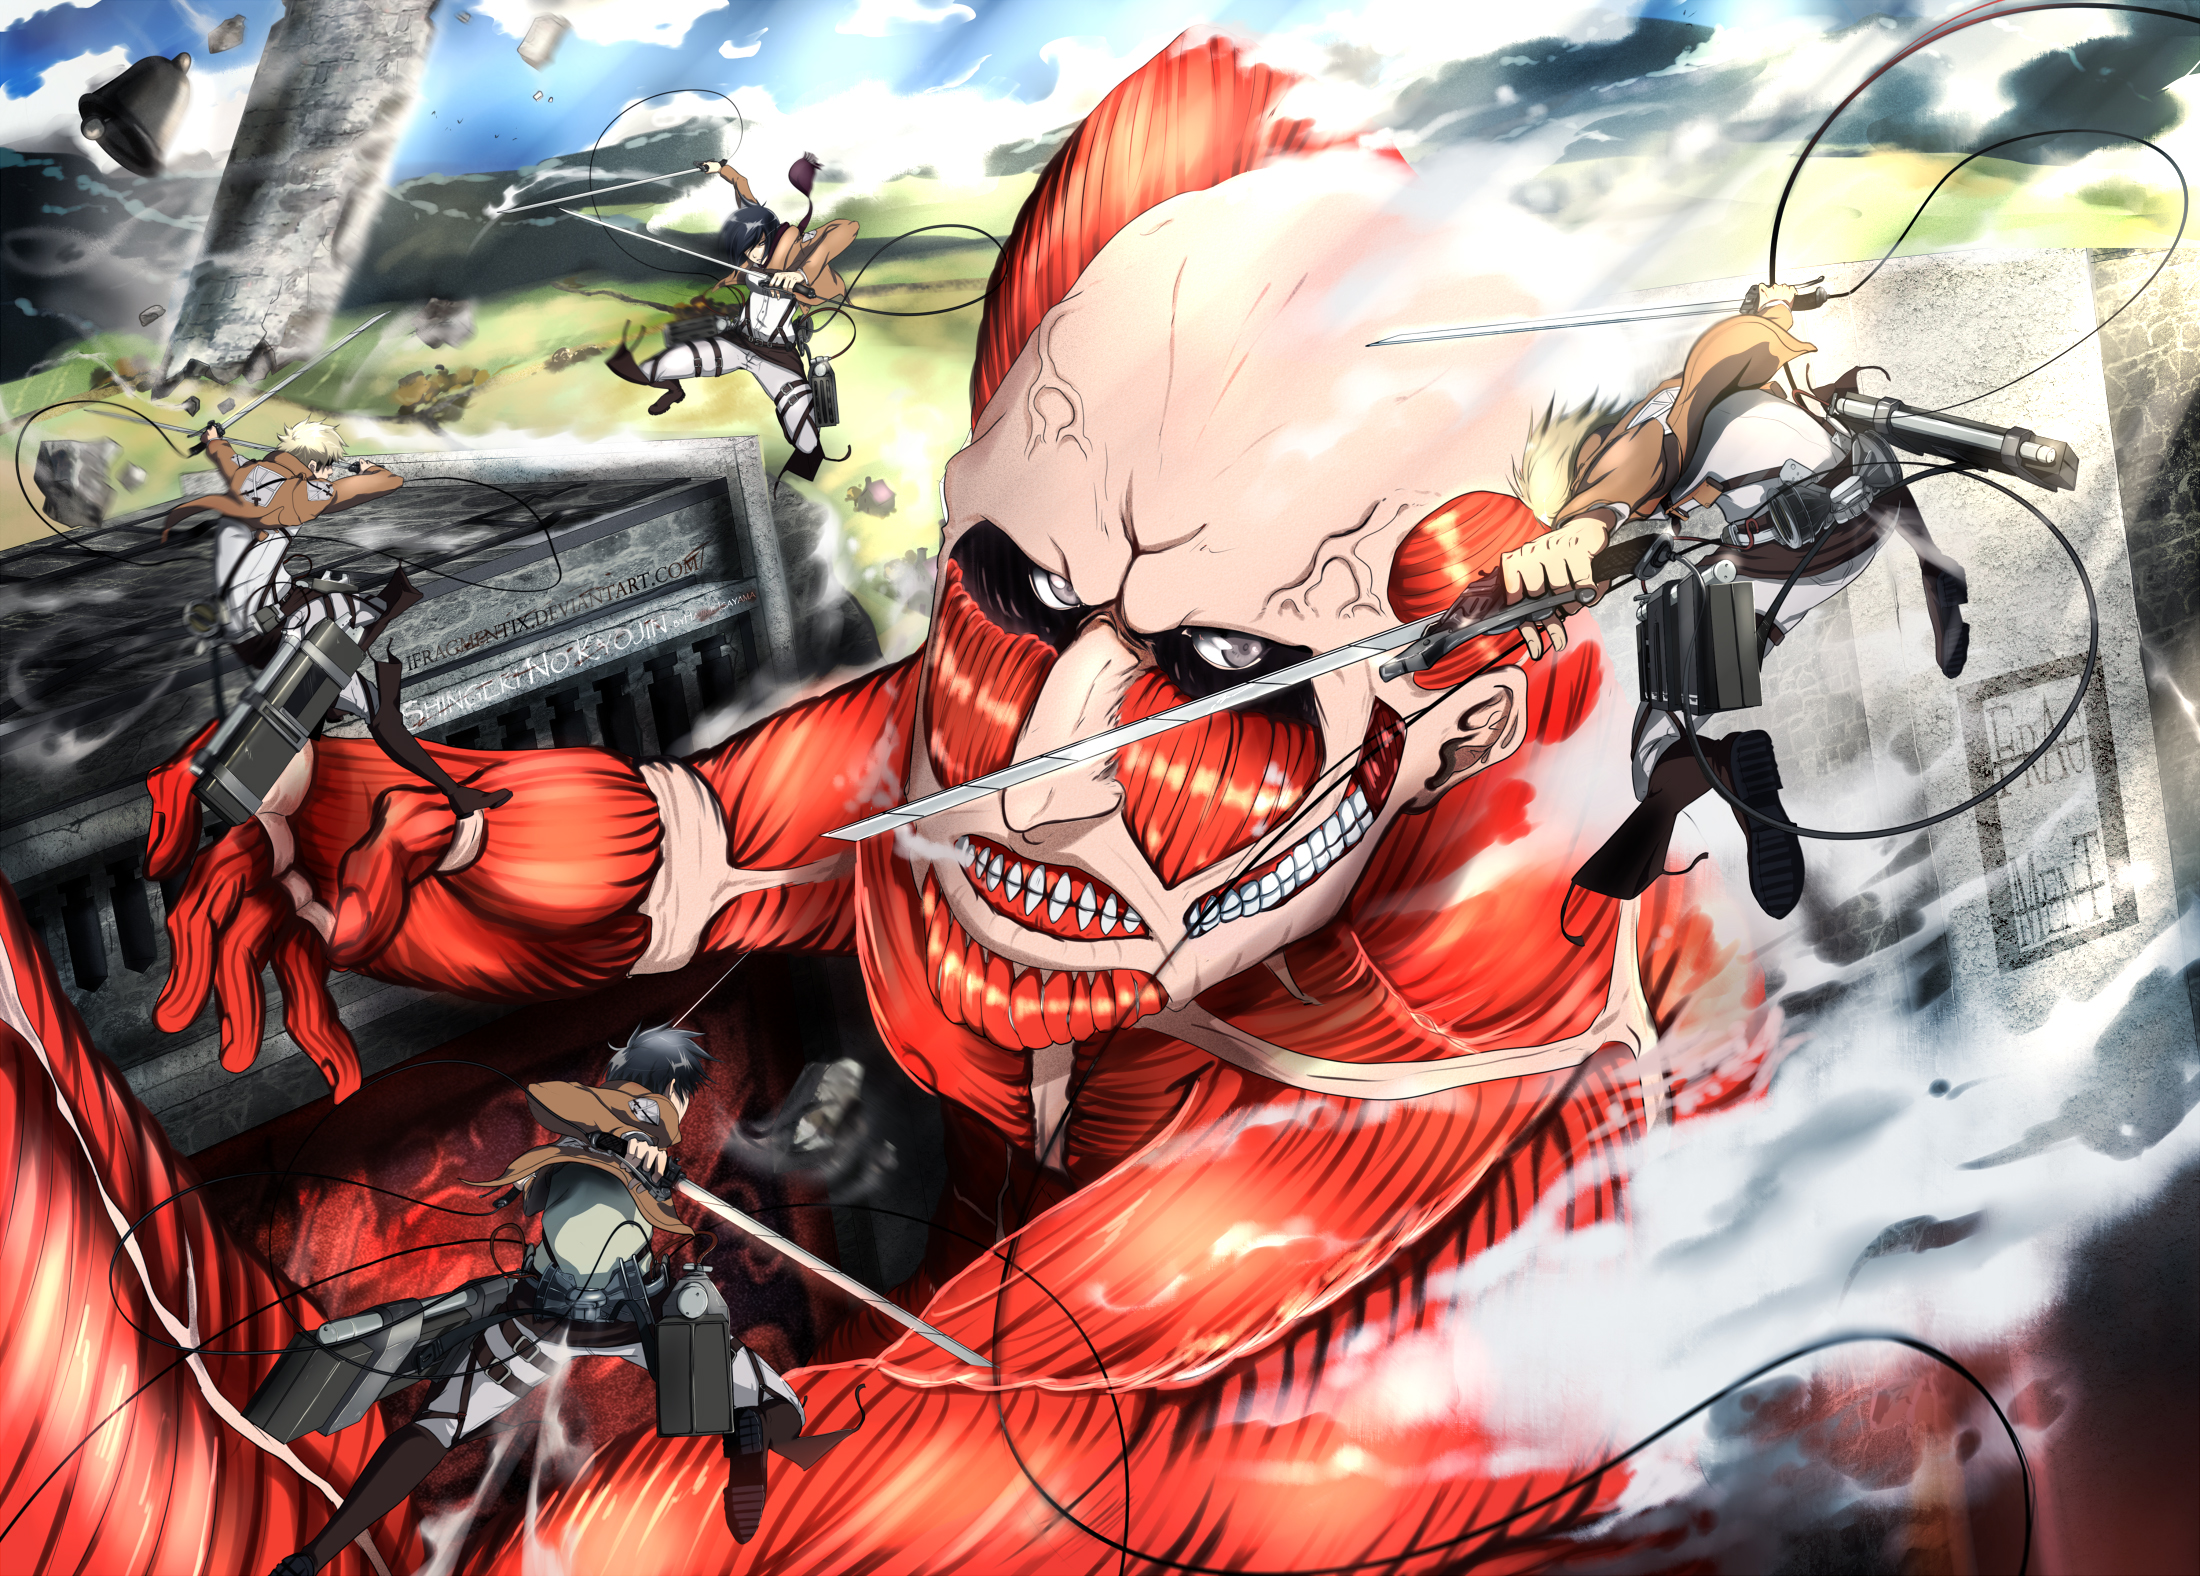 shingeki_no_kyojin___attack_on_titan_by_ifragmentix-d66mkr6